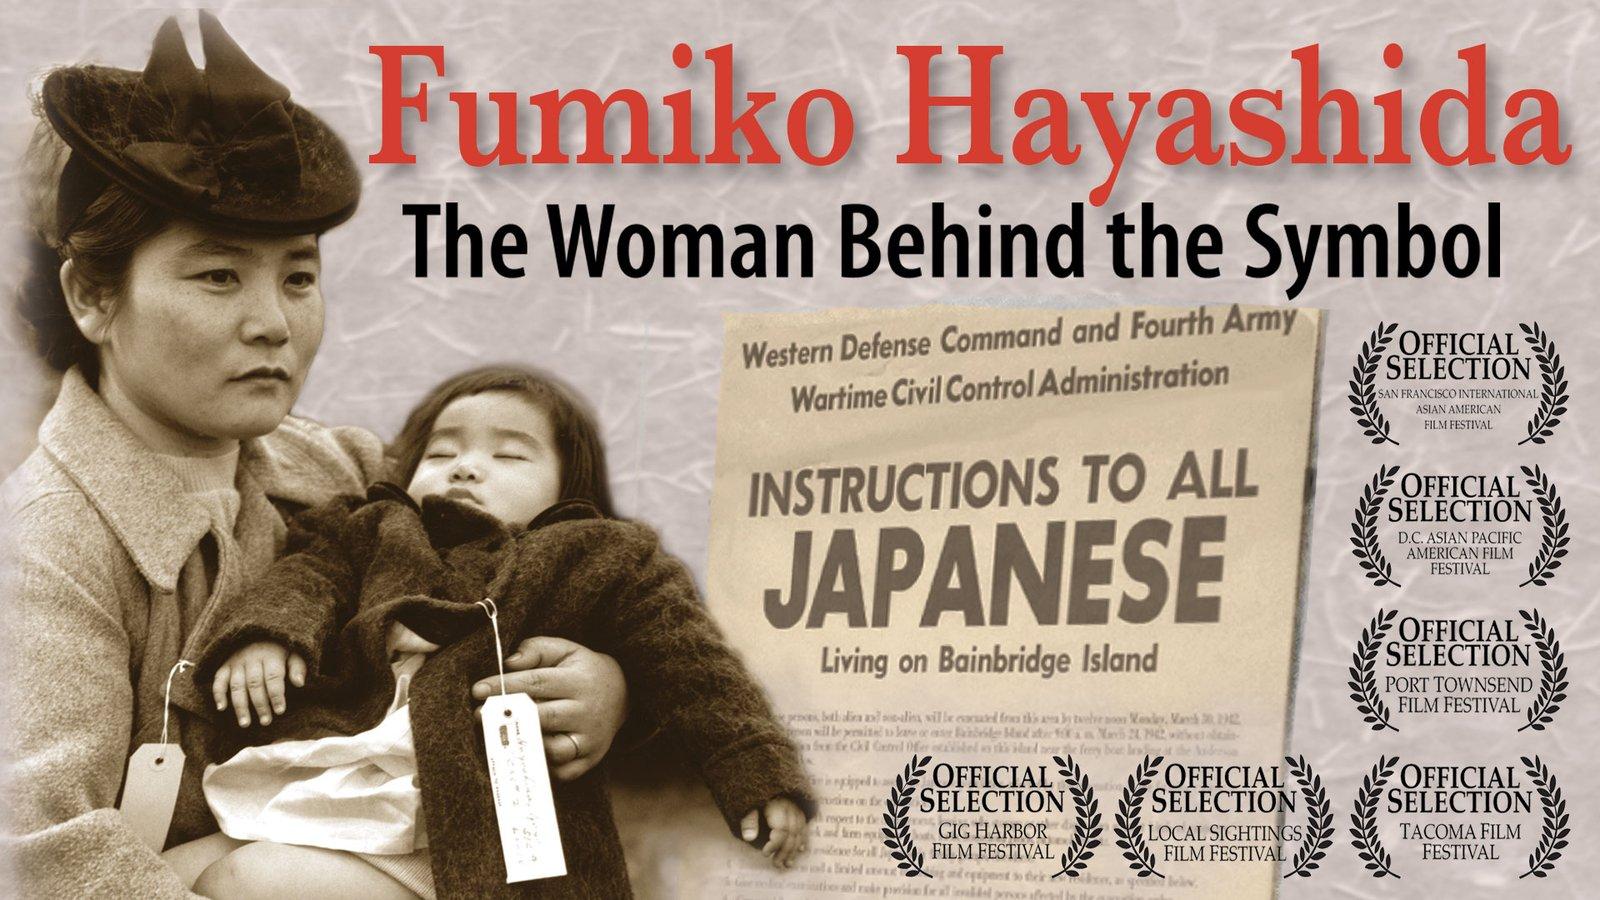 Fumiko Hayashida: The Woman Behind the Symbol - An Iconic Photo of a Japanese Internee